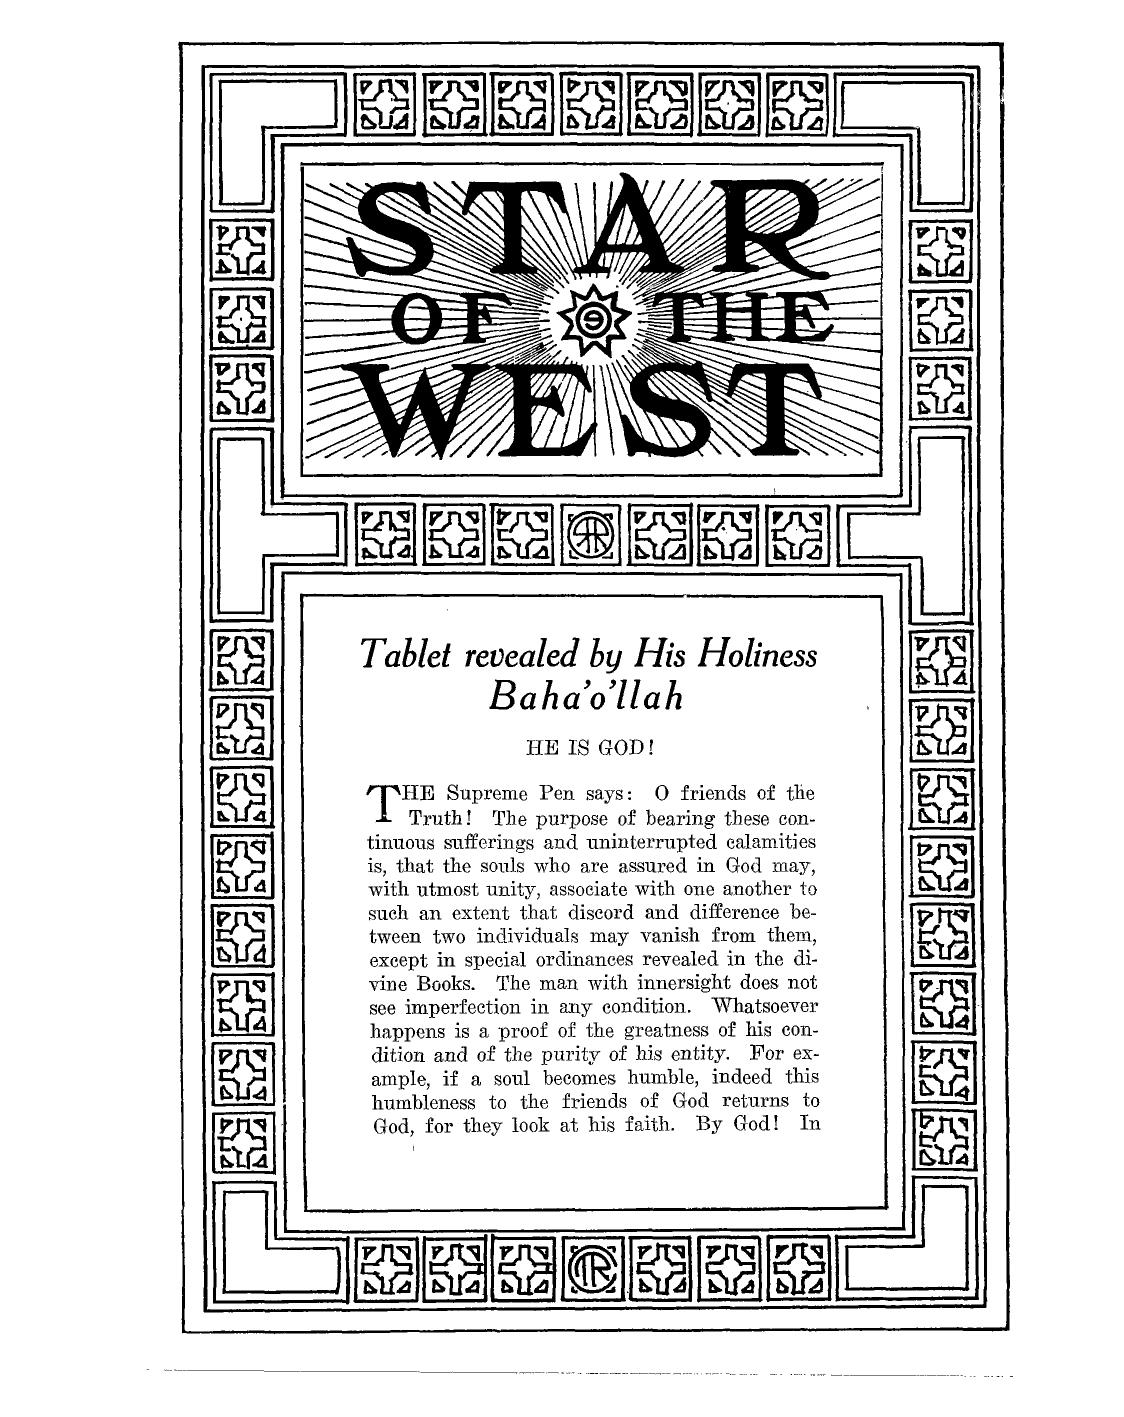 Star of the West, Vol. 10, No. 4, May 17, 1919, p. 60; Vol. 10, June 24, 1919, p. 110.